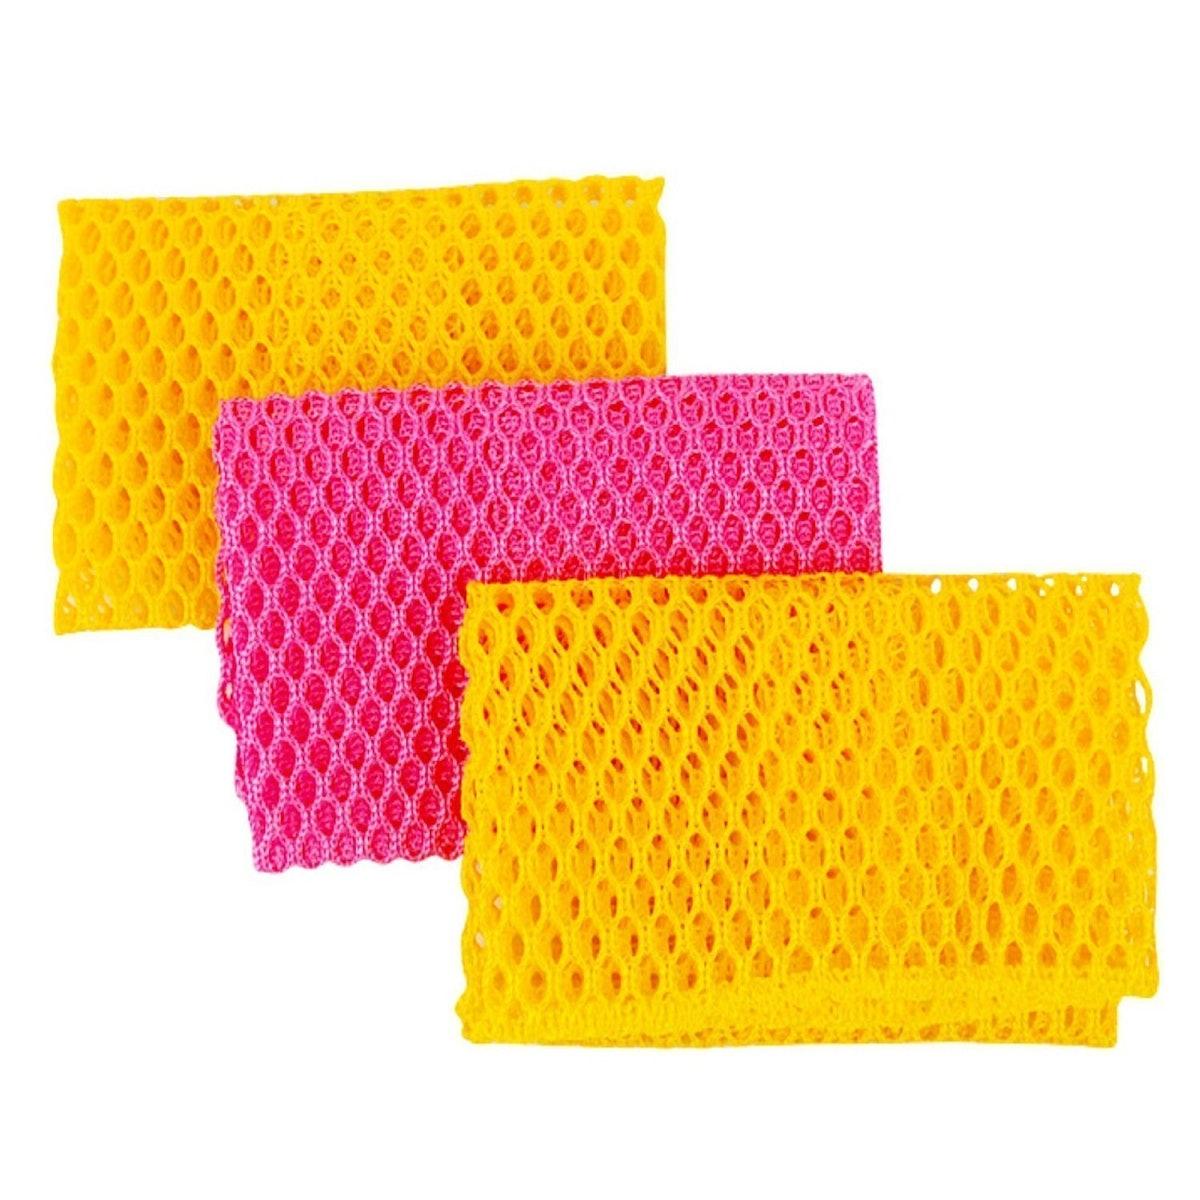 Top Clean Net Dishwashing Cloths (3-Pack)